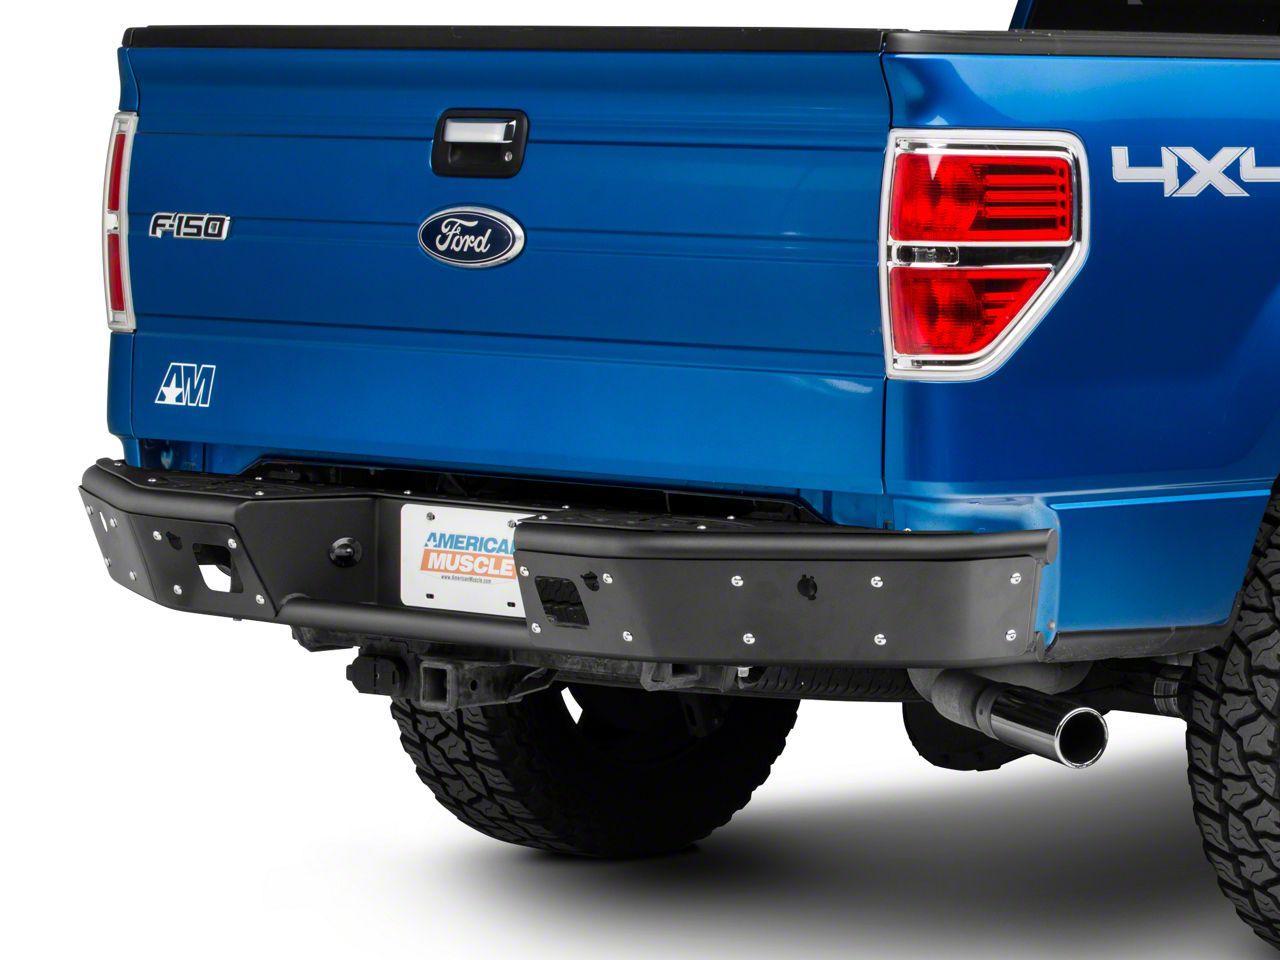 Addictive Desert Designs Stealth R Rear Bumper - Pre-Drilled for Backup Sensors (09-14 F-150)